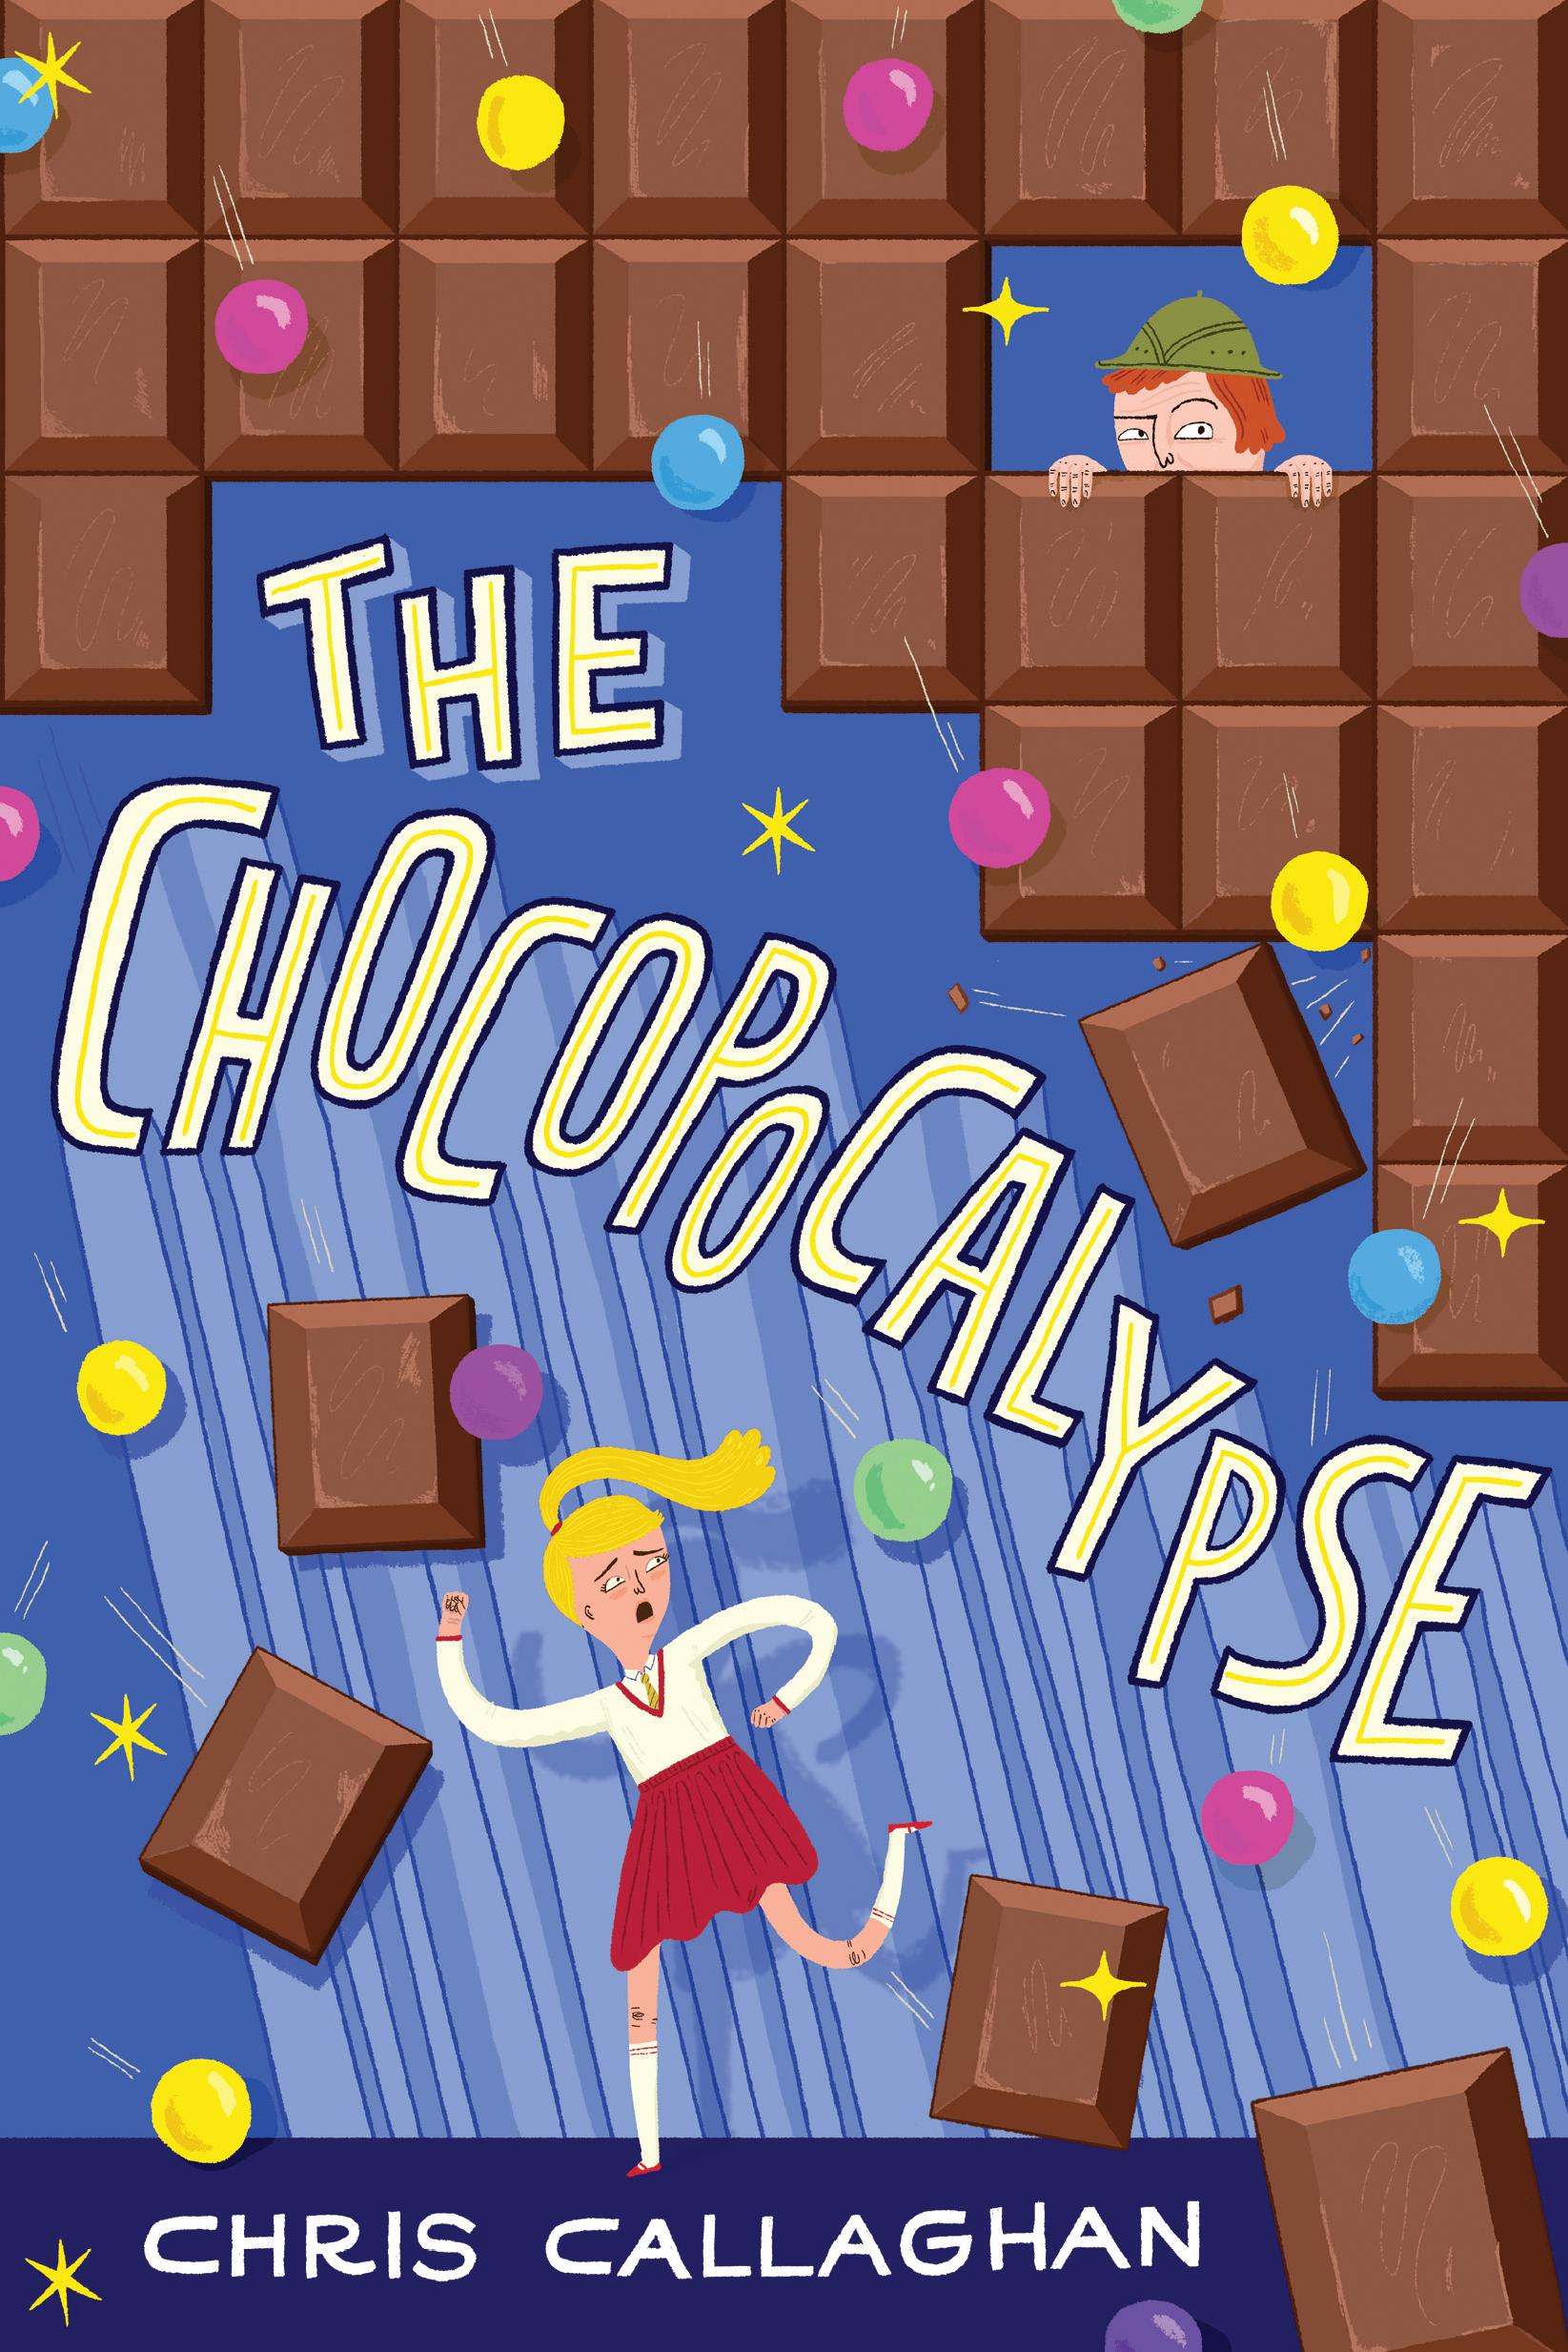 The Chocopocalypse, chocolate, book, US, USA, The Great Chocoplot, Chris Callaghan